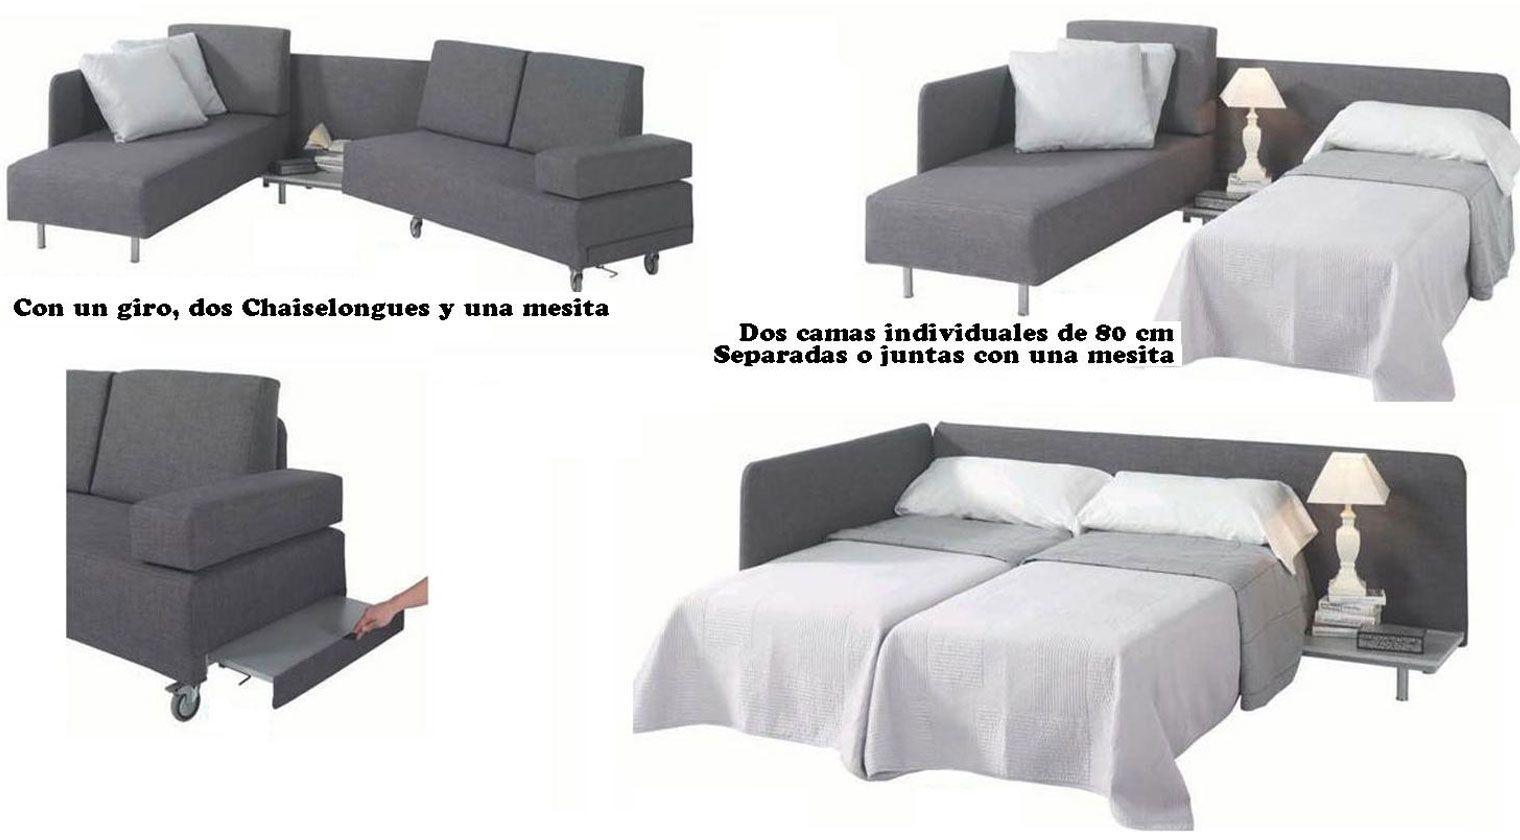 Sof cama laval sofas cama convertibles for Sofa chaise longue cama barato